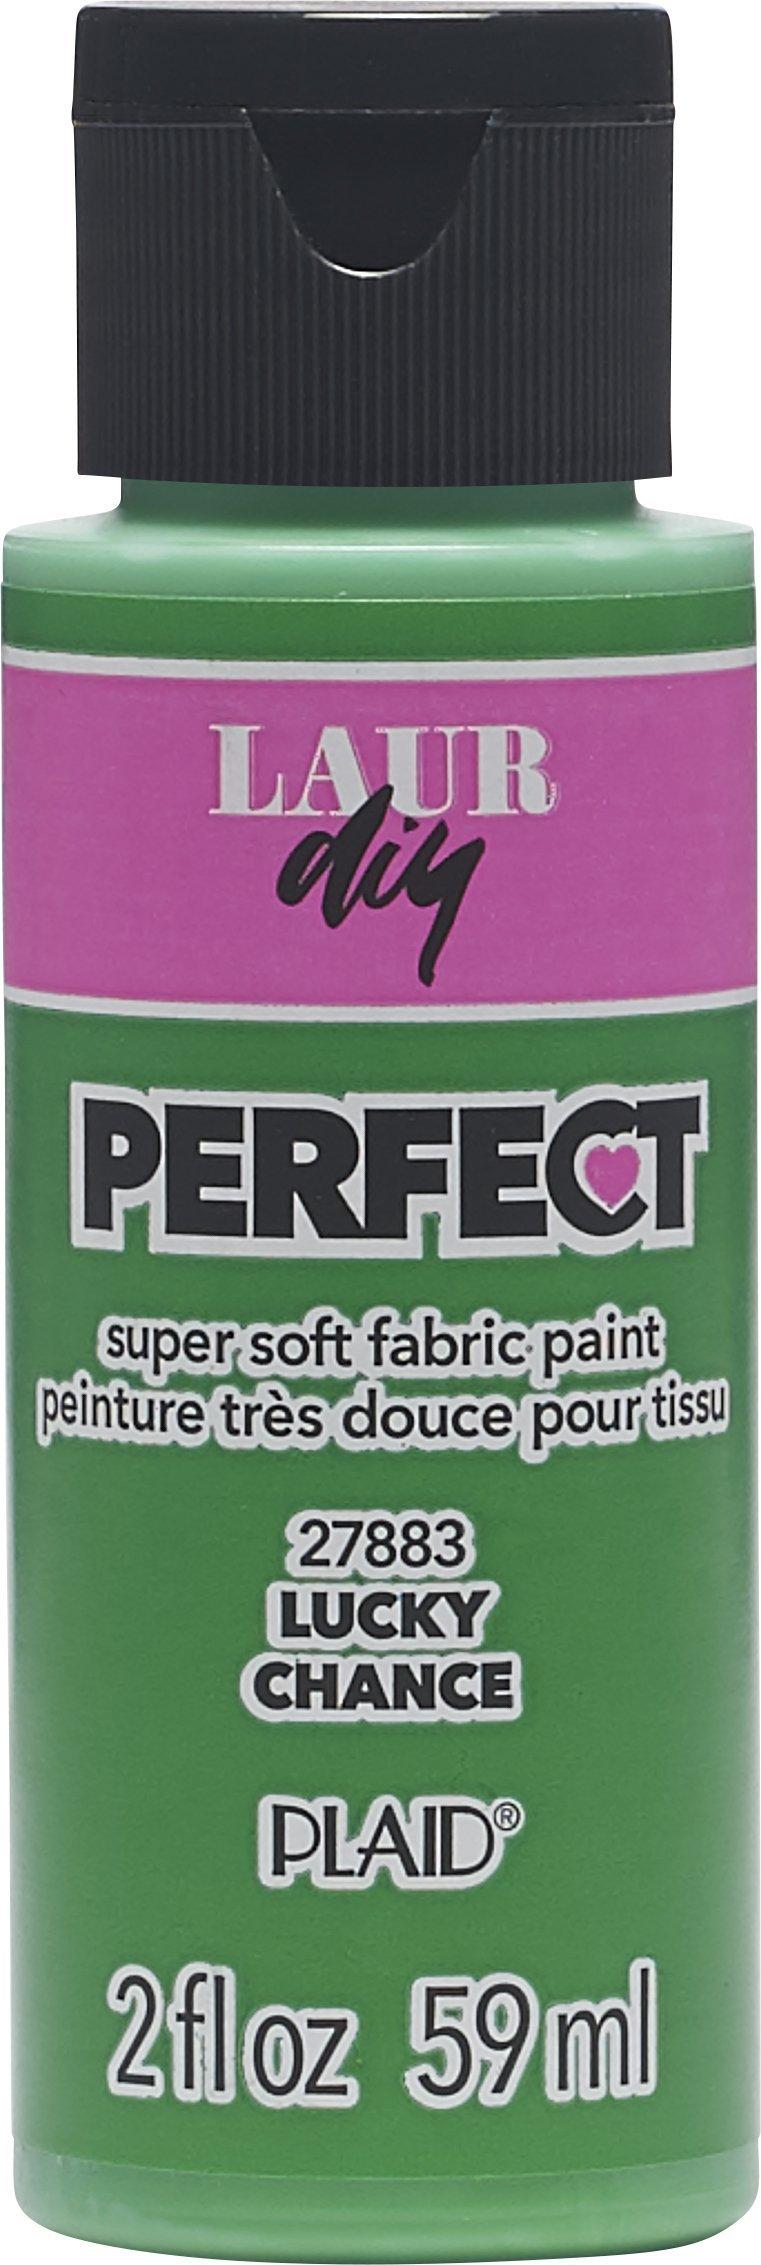 LaurDIY Perfect Fabric Paint, 2 oz, Lucky